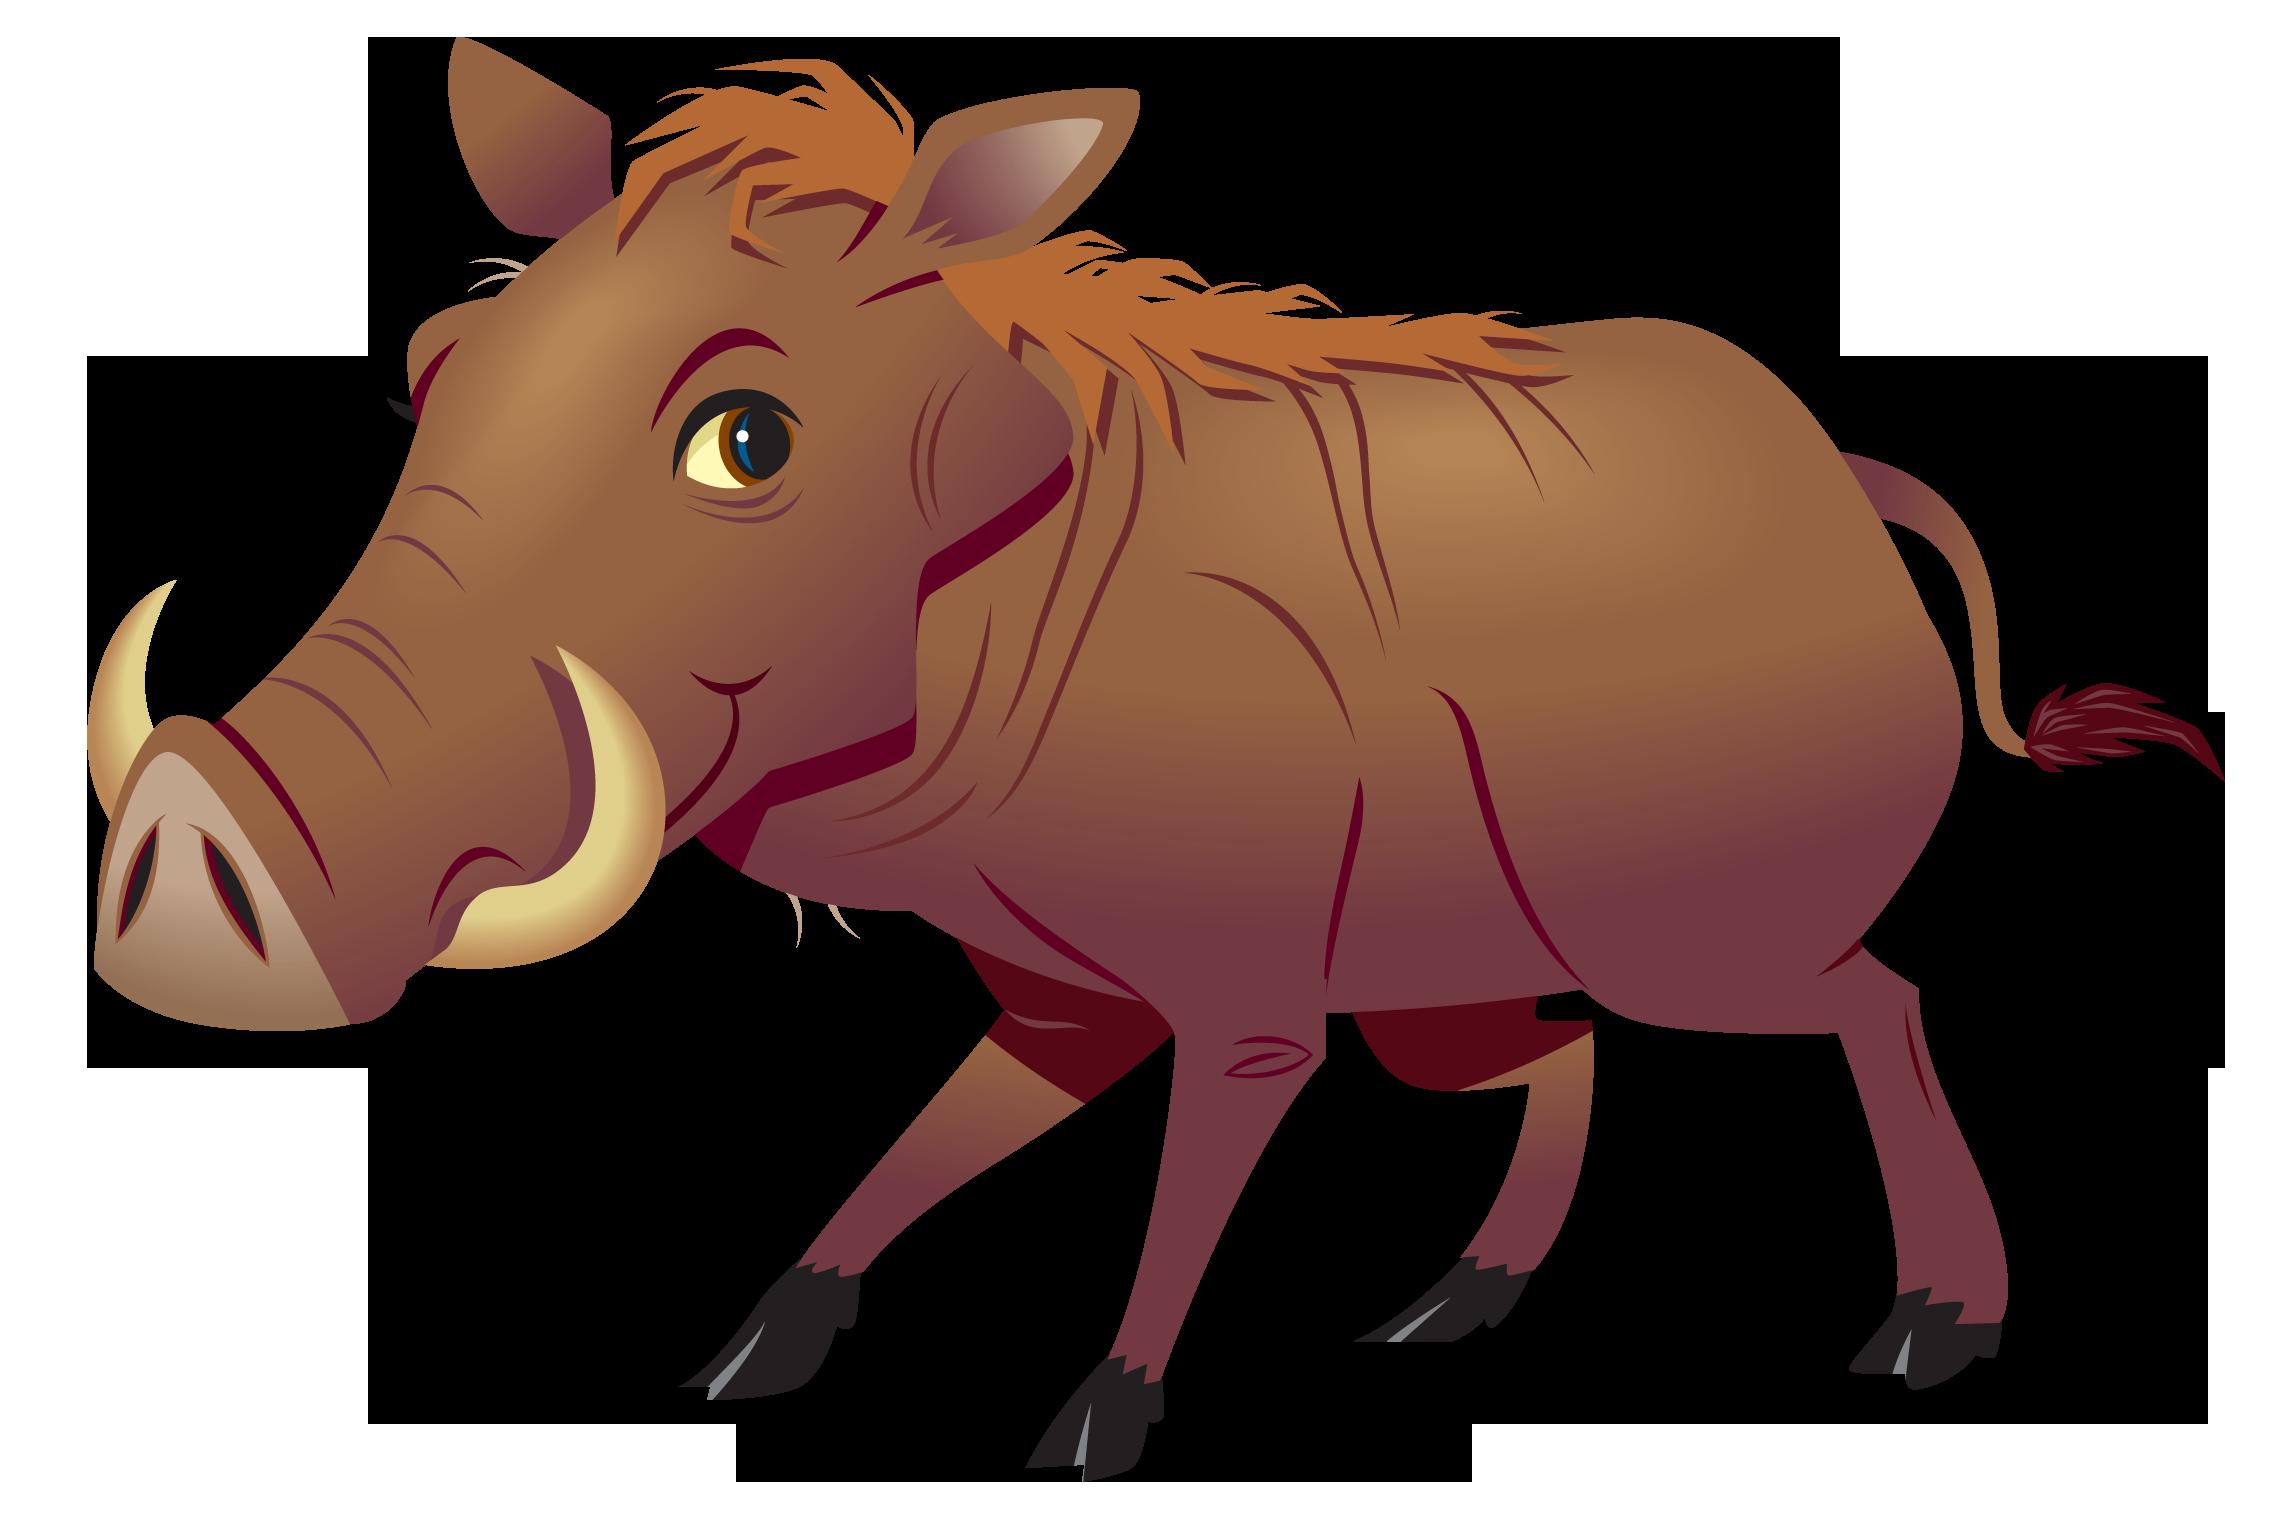 Clip art,Snout,Cartoon,Warthog,Livestock,Boar,Bovine,Suidae.